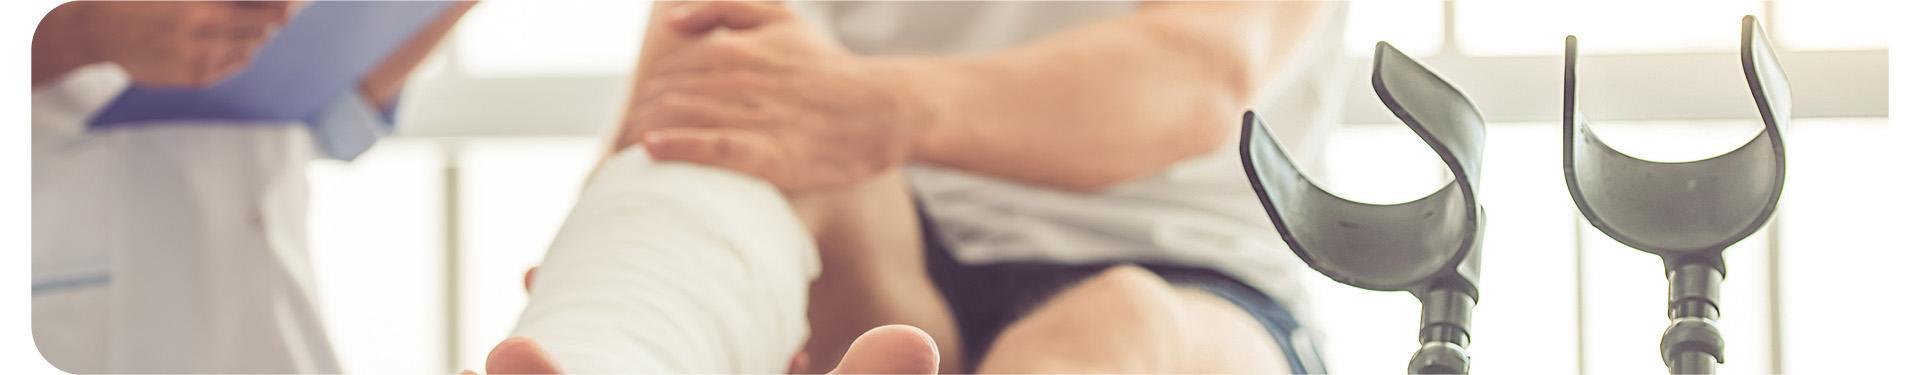 Rehabilitacja nogi